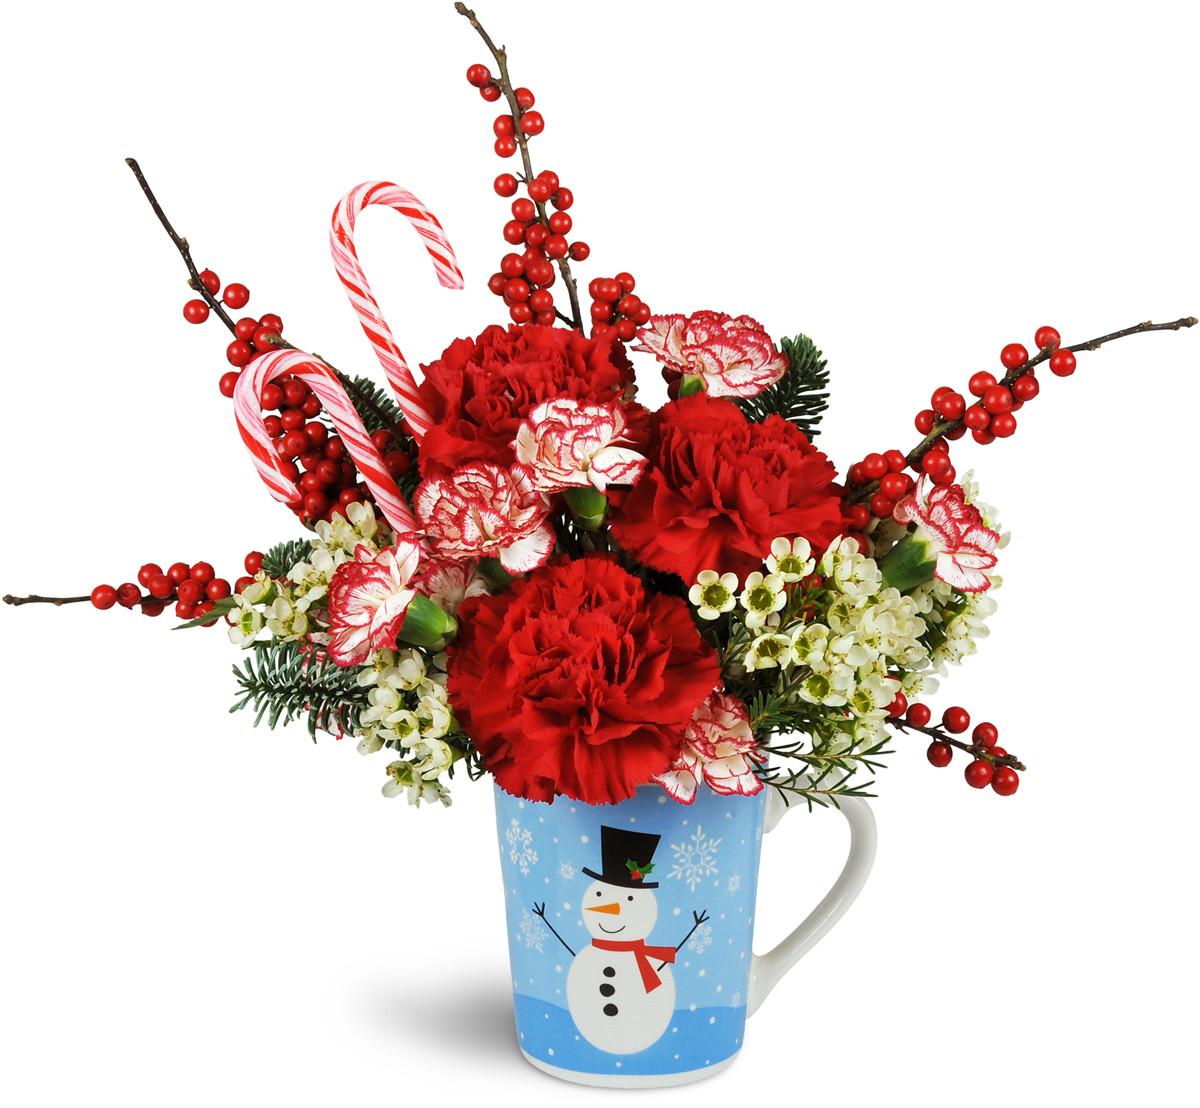 Baby Gift Baskets Kitchener : Holiday hug in a mug kitchener on florist